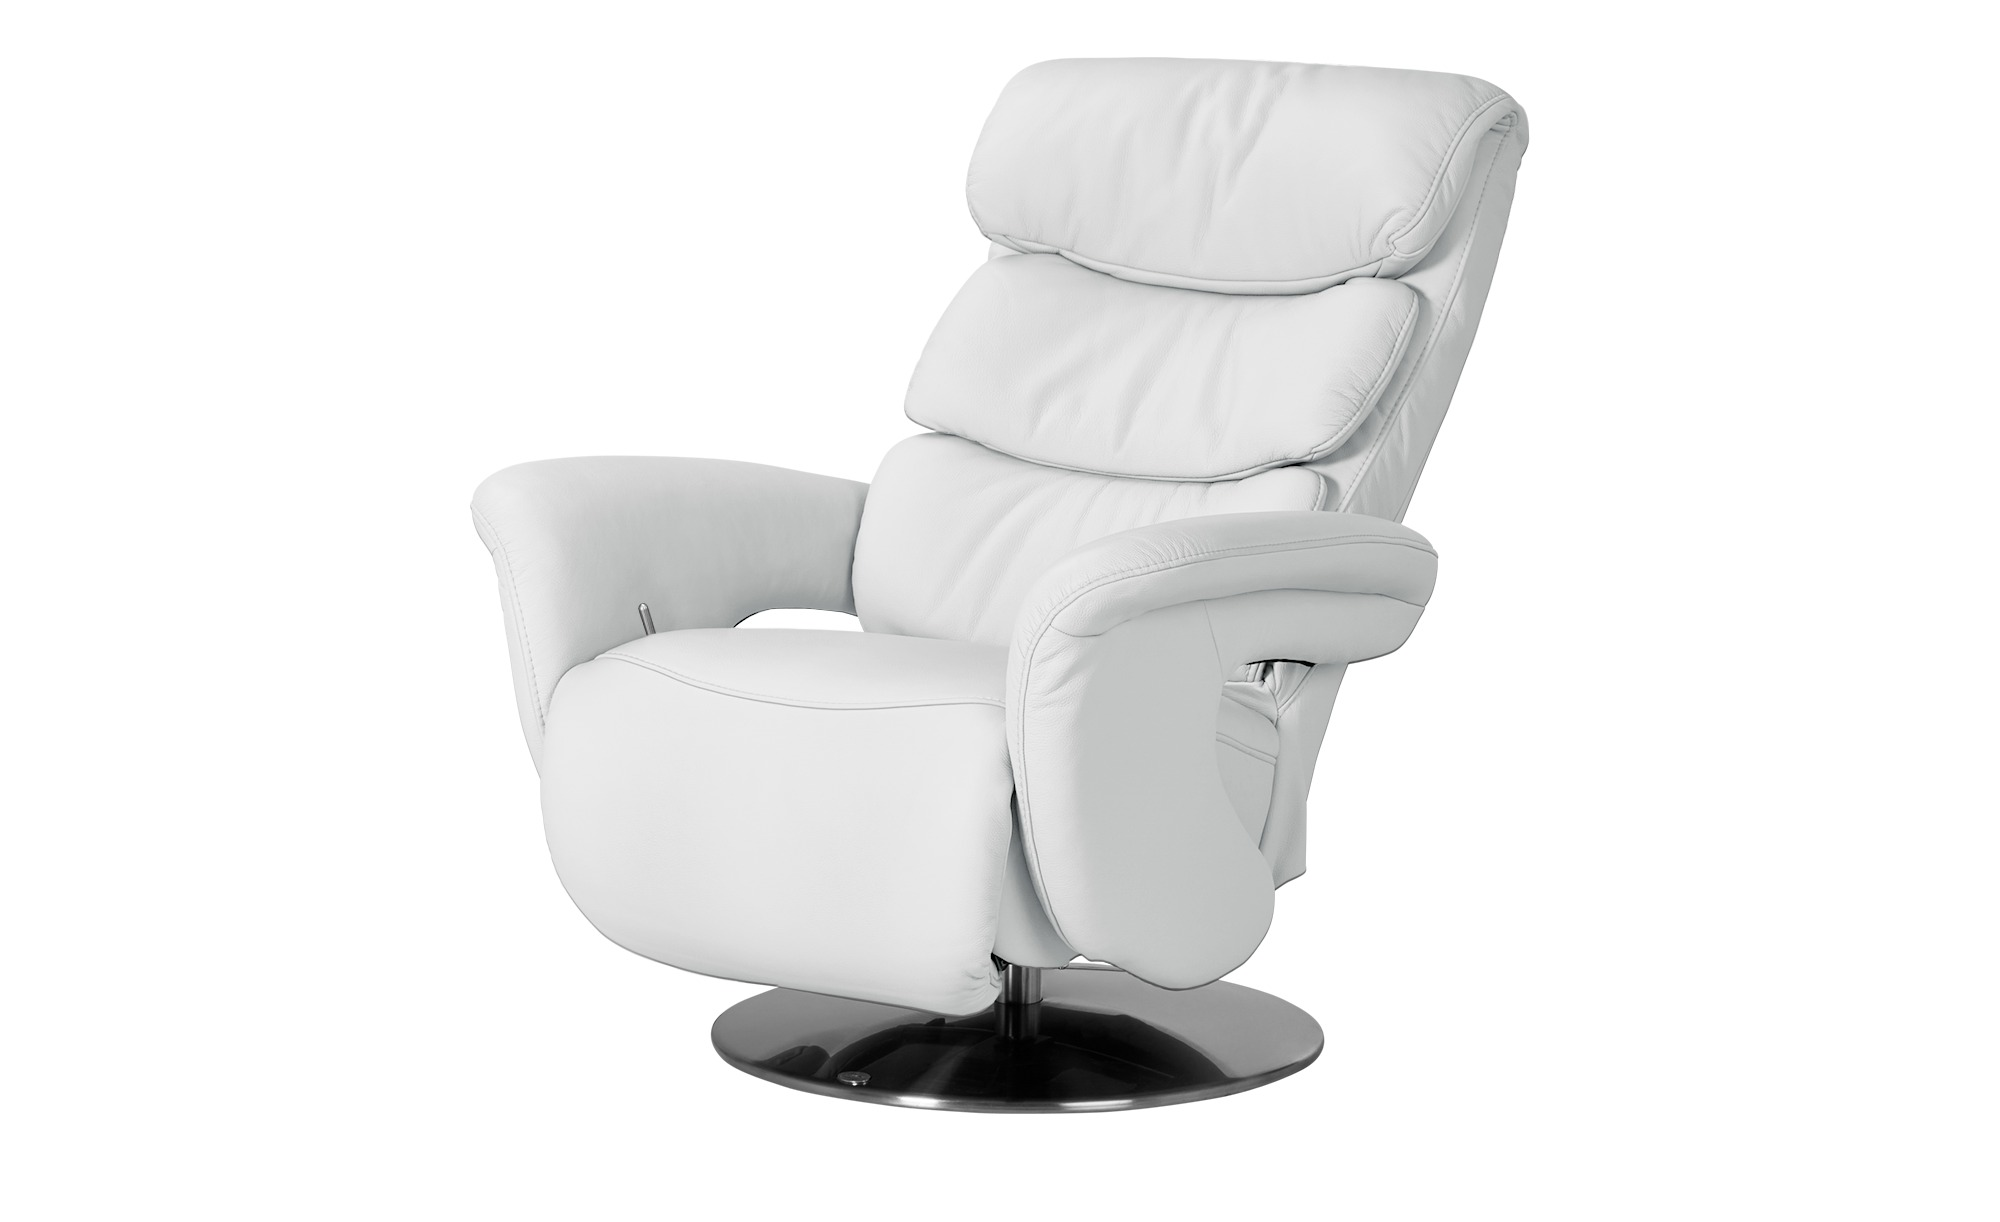 himolla Leder-Relaxsessel weiß - Leder 7228 ¦ weiß ¦ Maße (cm): B: 83 H: 107 T: 88 Polstermöbel > Sessel > Fernsehsessel - Höffner